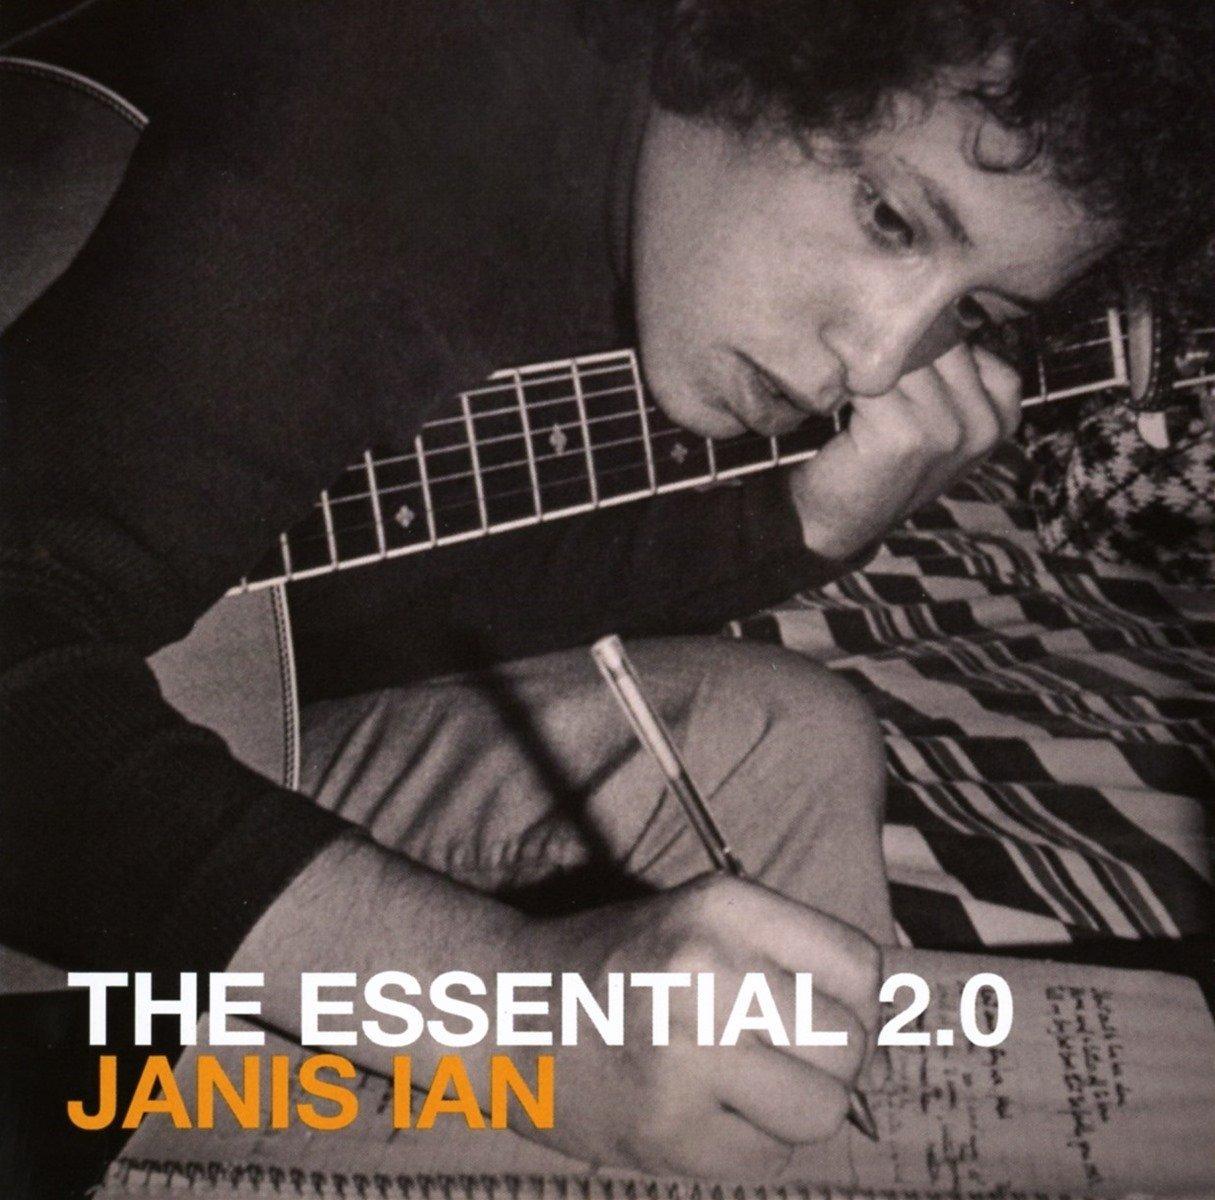 2.0 Janis Ian The Essaential